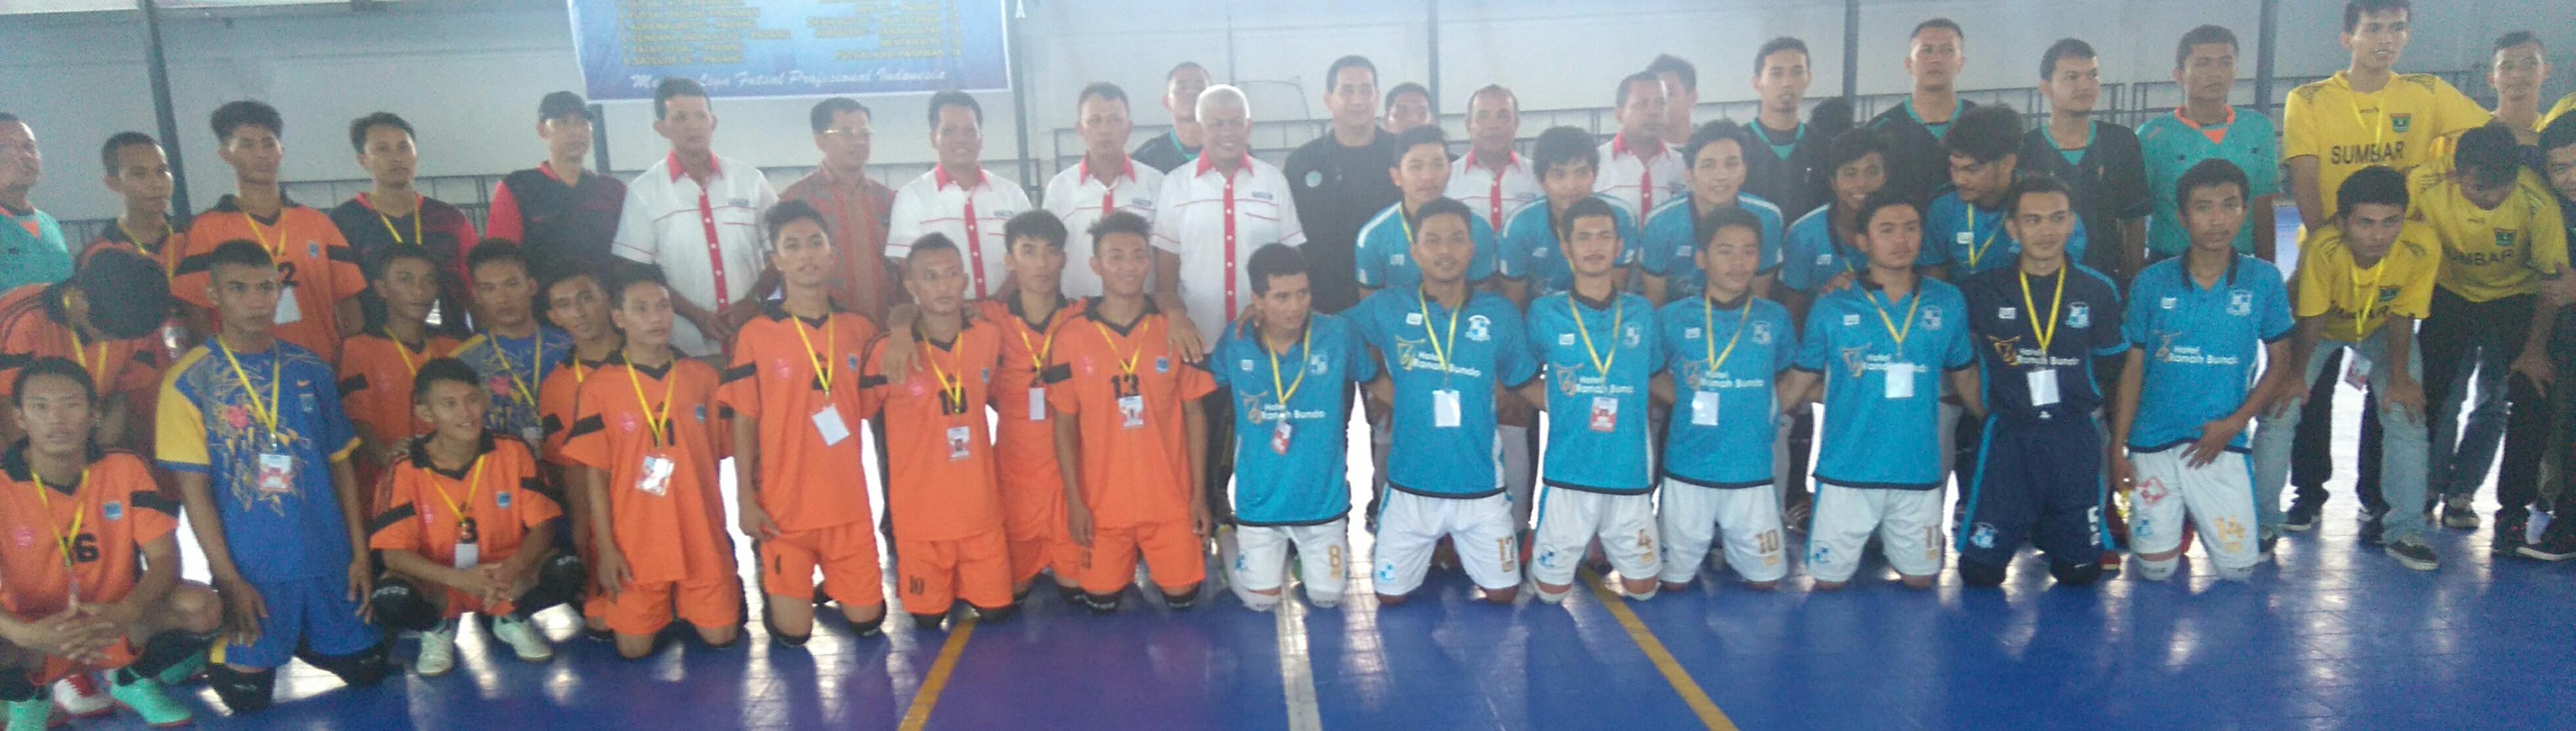 tim Mentawai dan Cendana Andalas bersama KONI, pengurus AFD dan panitia LFN Sumbar.